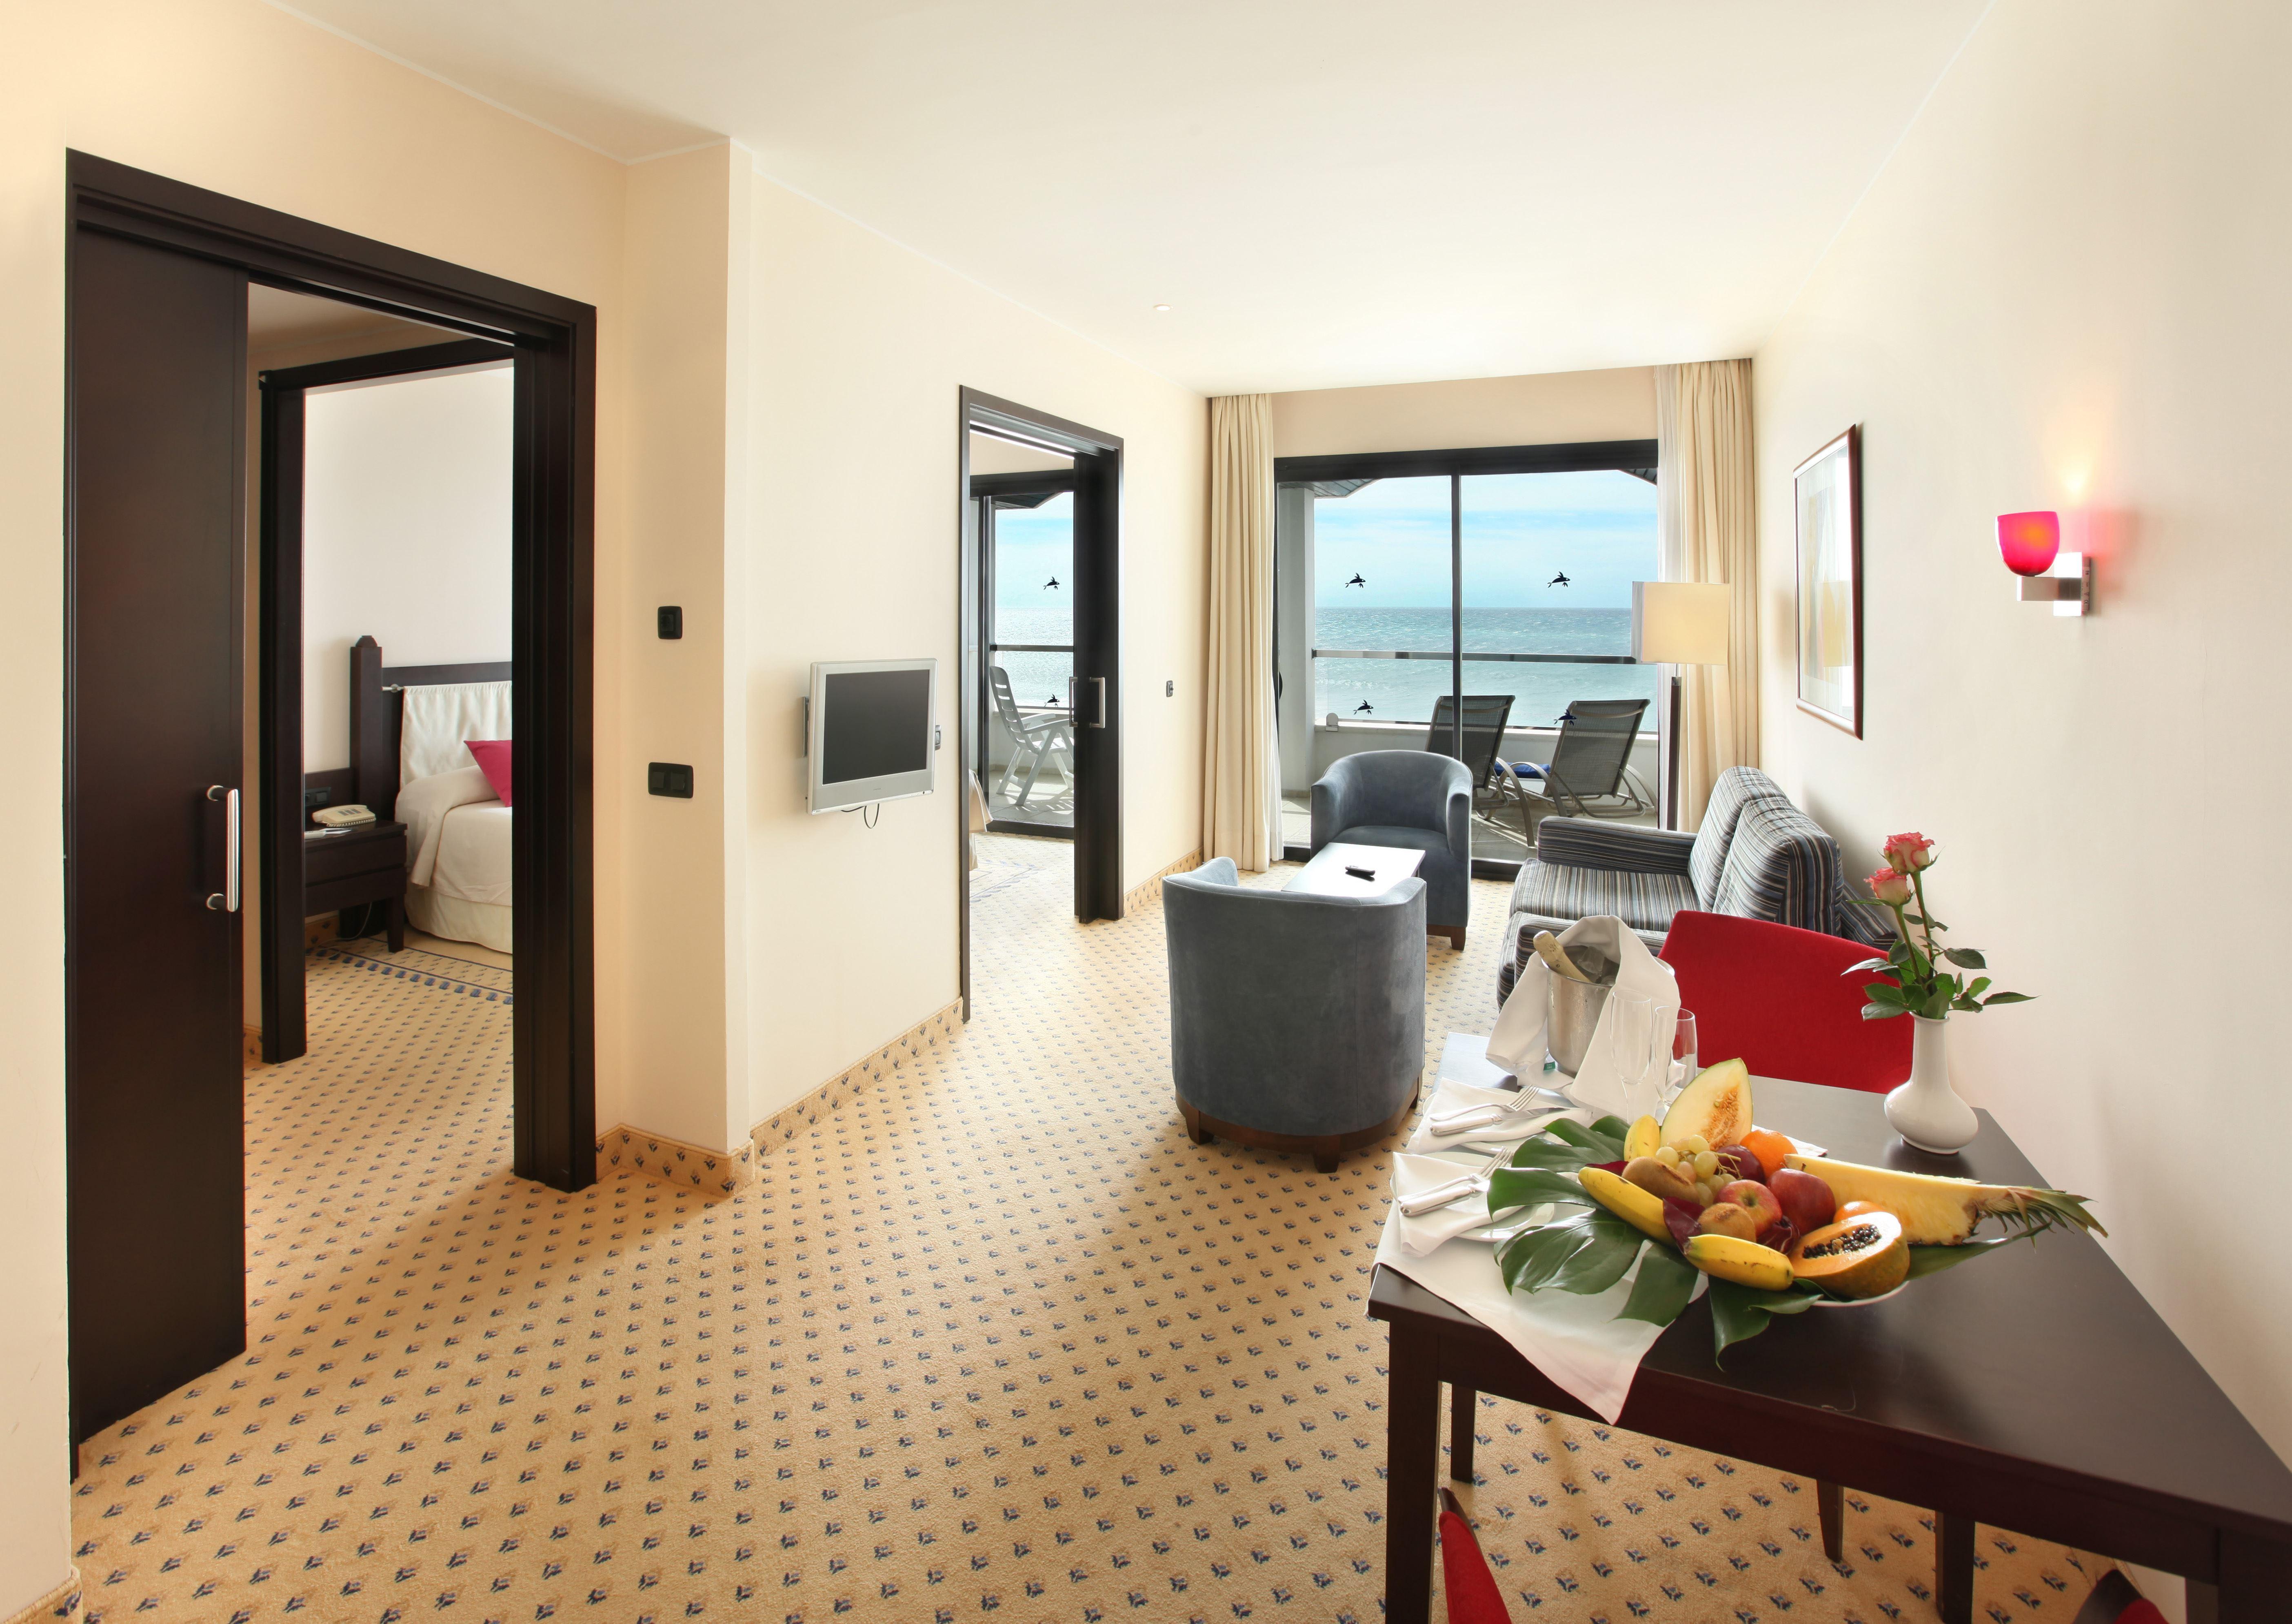 Svit IFA Faro Hotell, Maspalomas Gran Canaria, Signaturresor